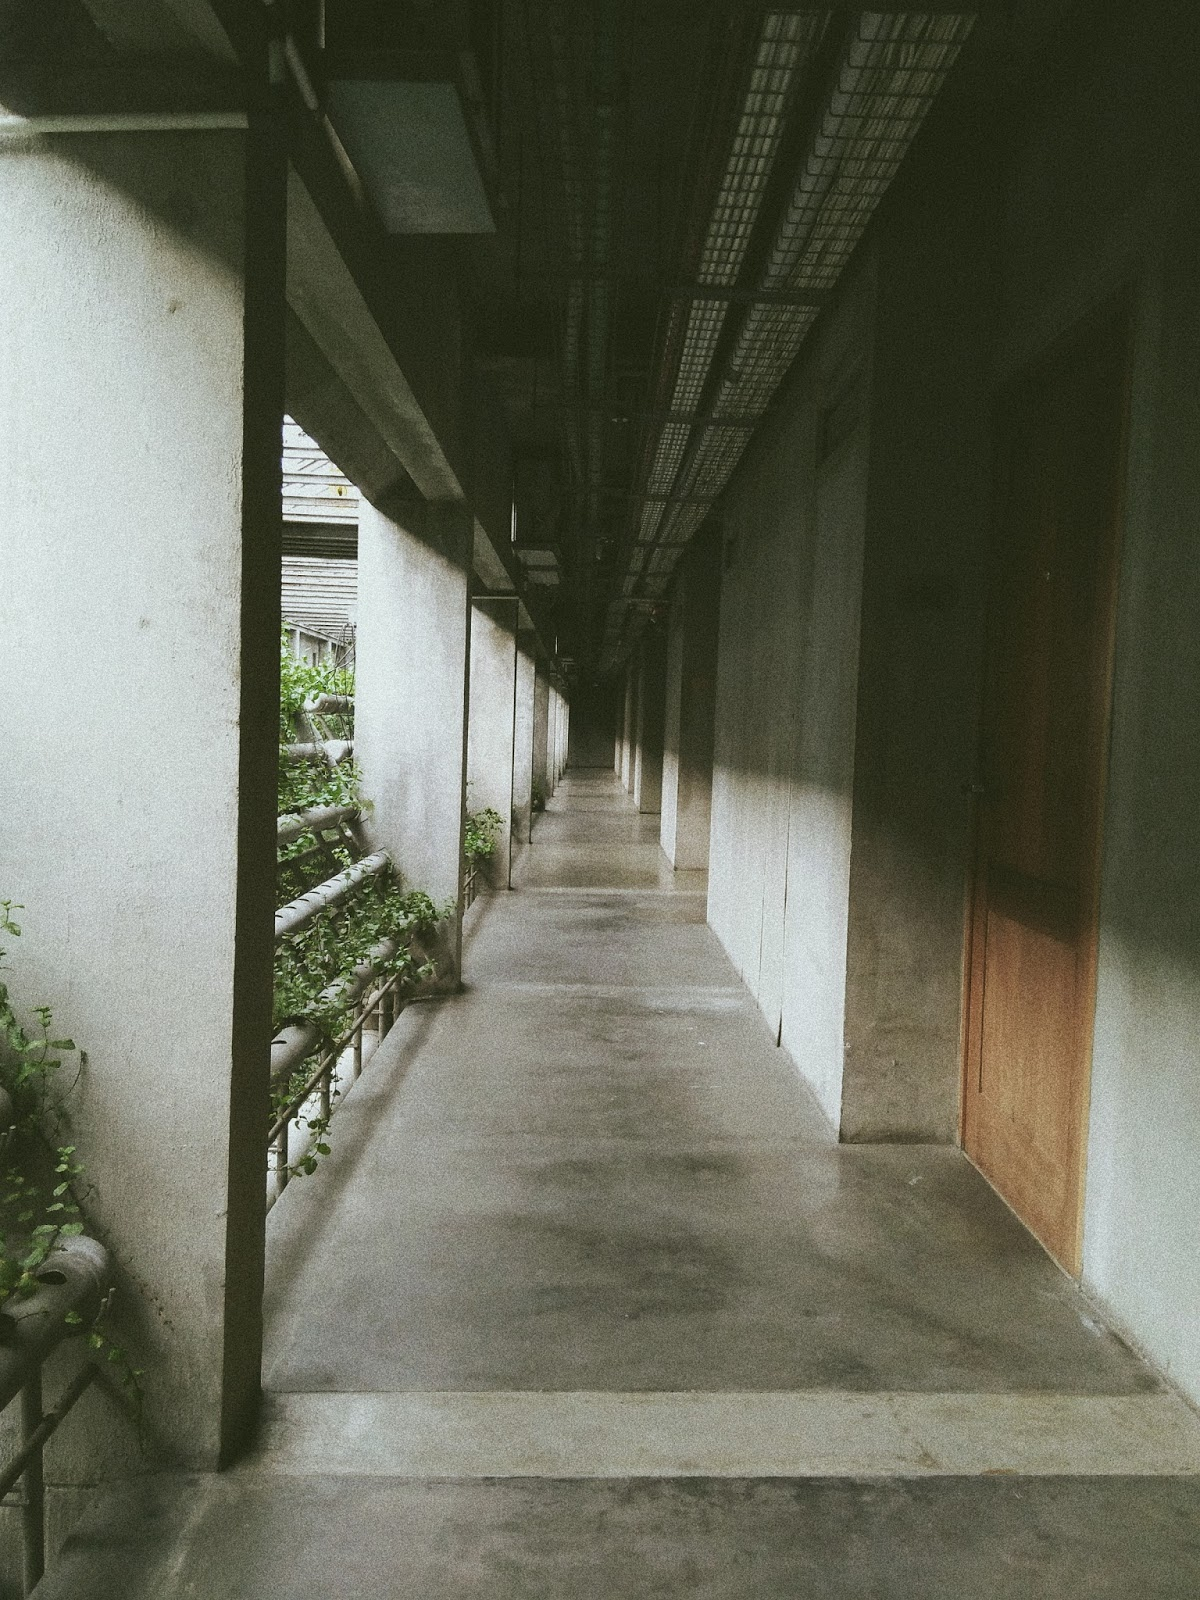 Menyusuri Prawirotaman Jogja : Hidup Ketika Pagi, Redup Kala Malam Menanti - Greenhost Rooms